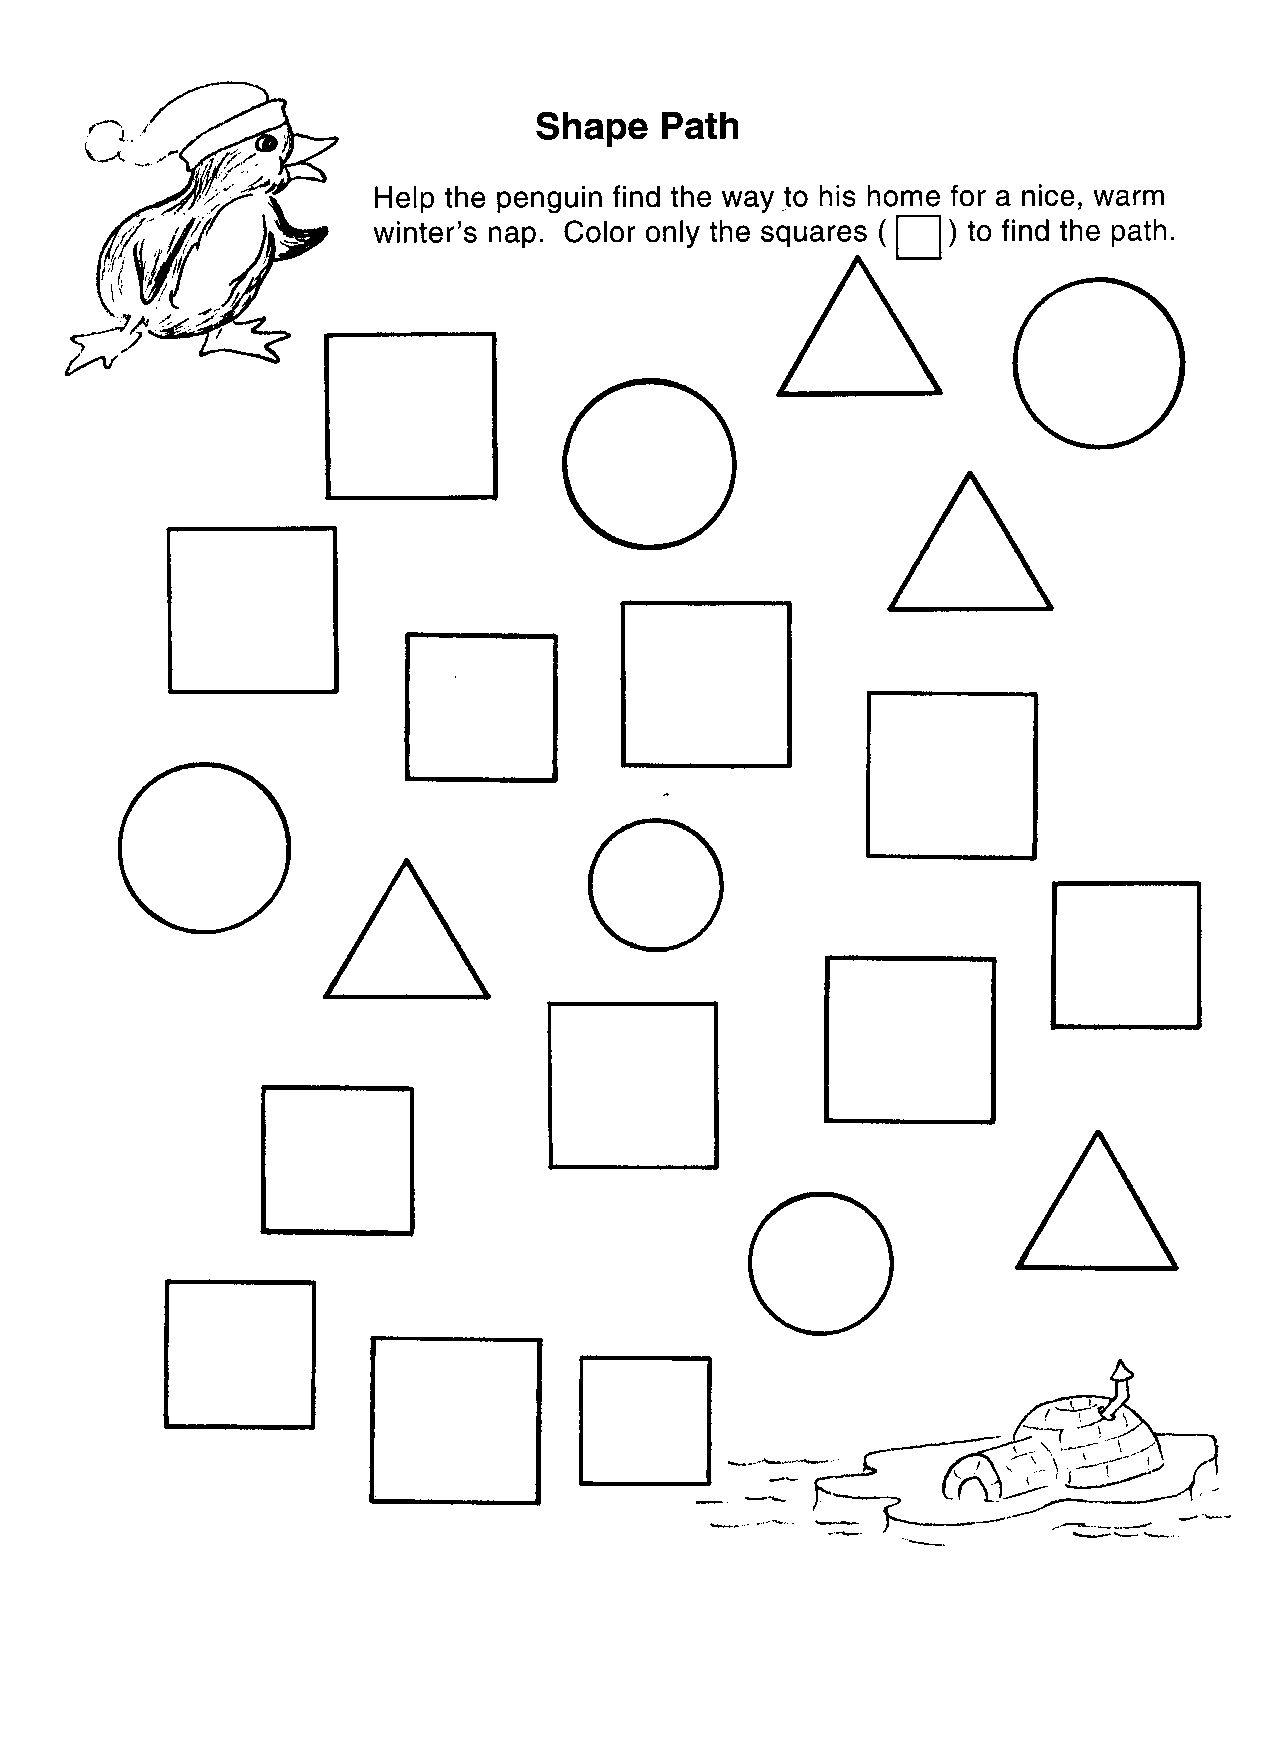 shape recognition preschool shapes maze worksheet worksheets for kids preschool worksheets. Black Bedroom Furniture Sets. Home Design Ideas